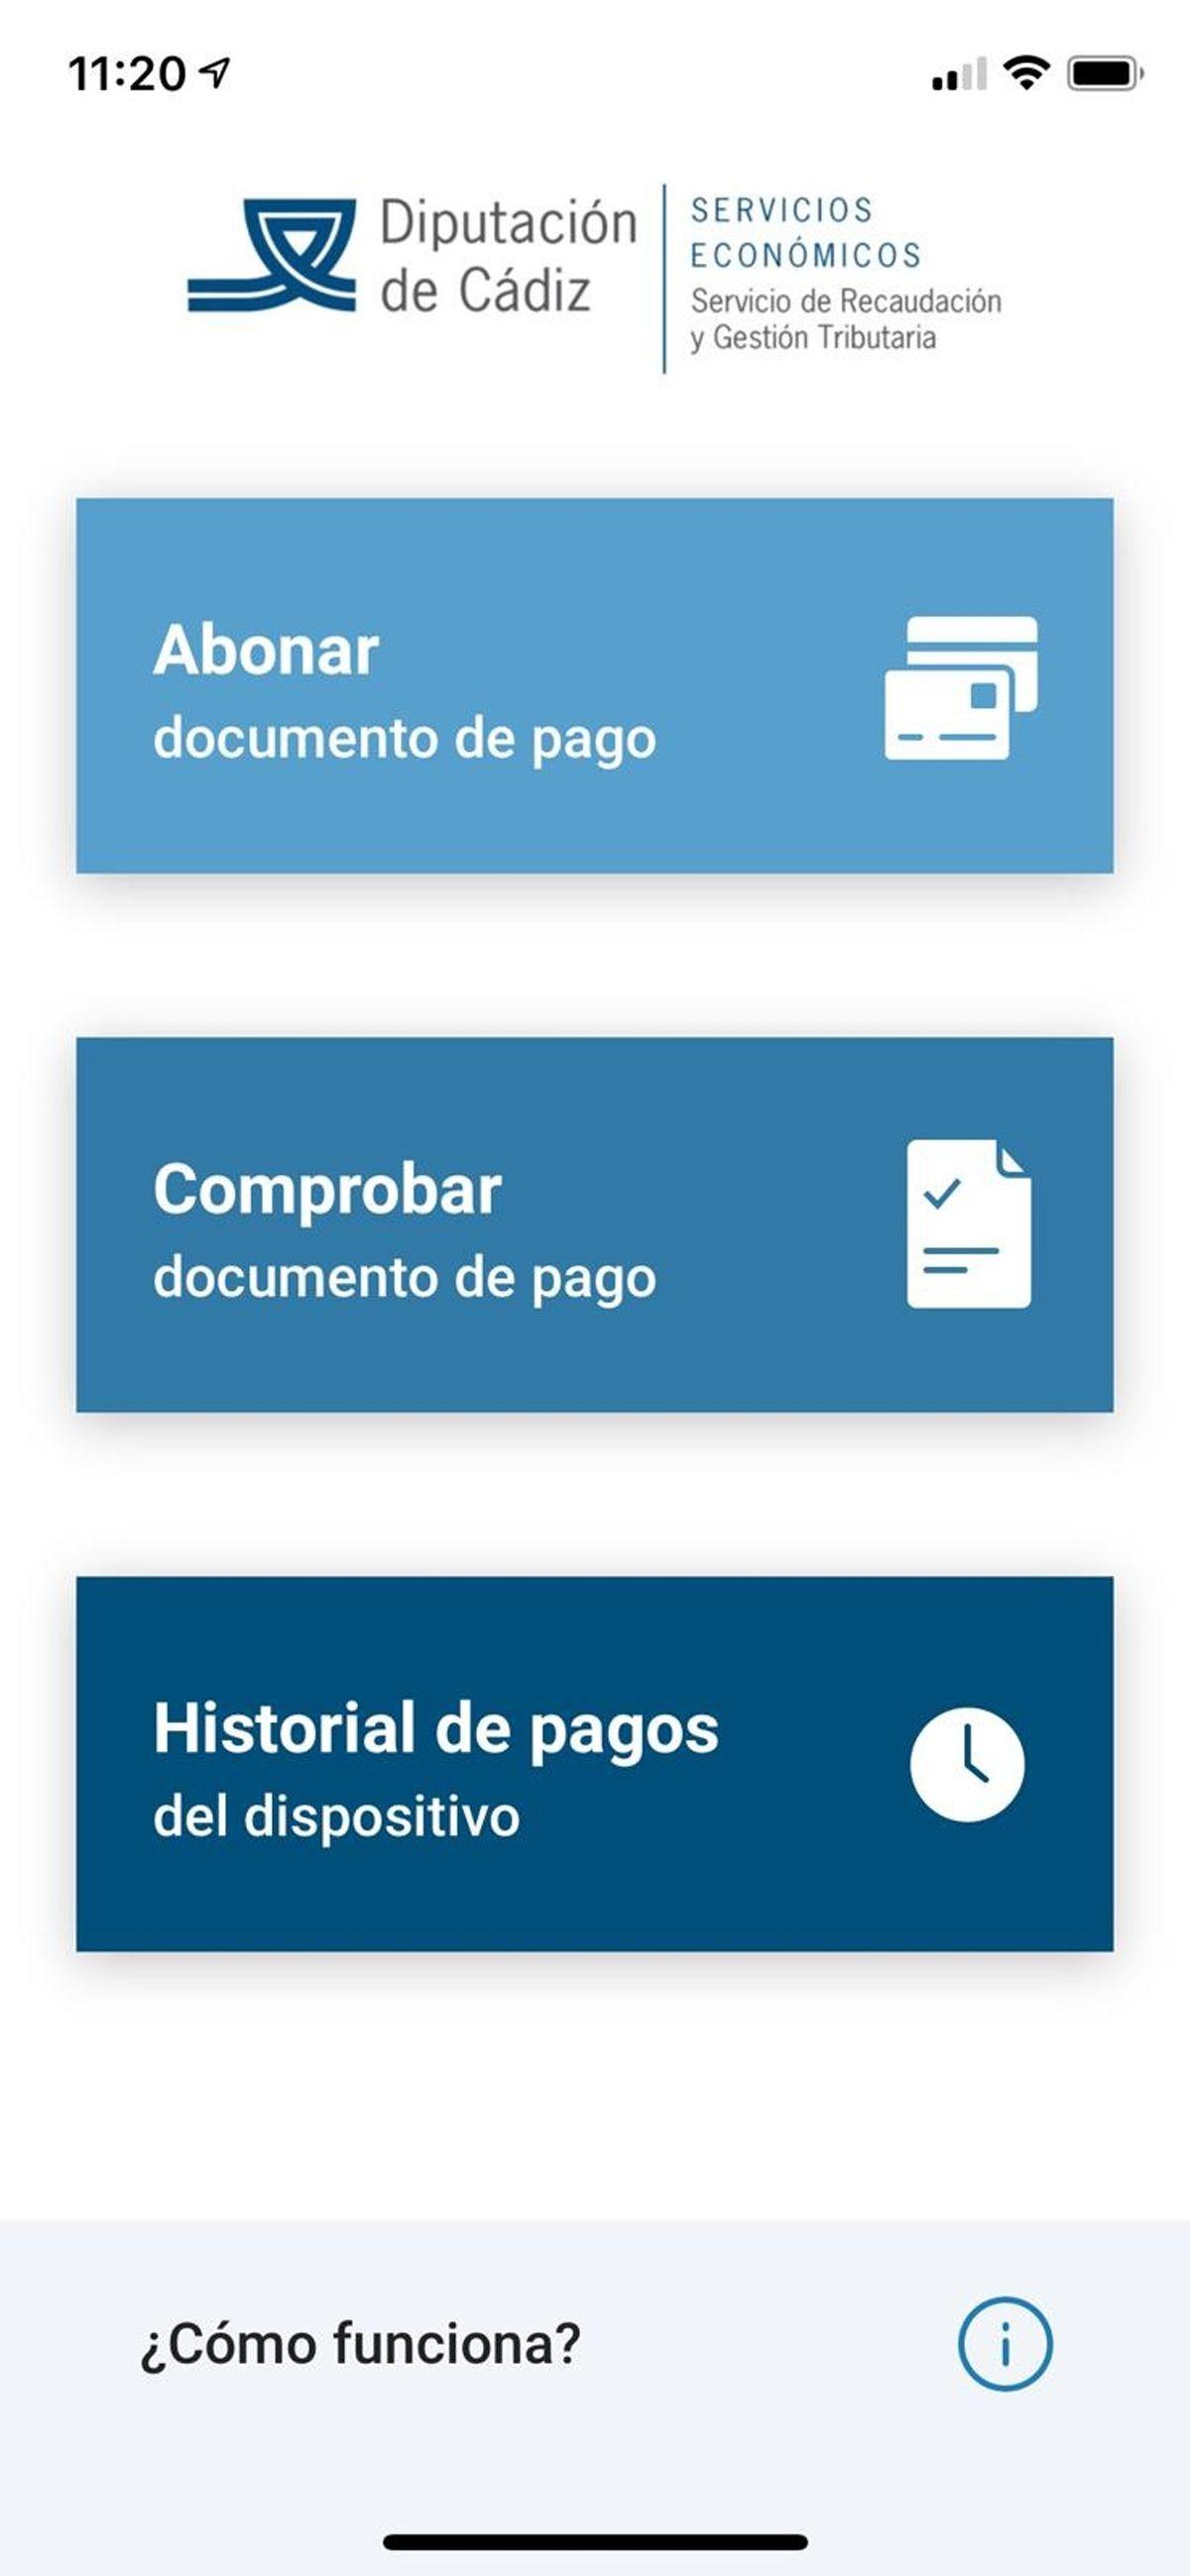 aplicación de la diputación de Cádiz